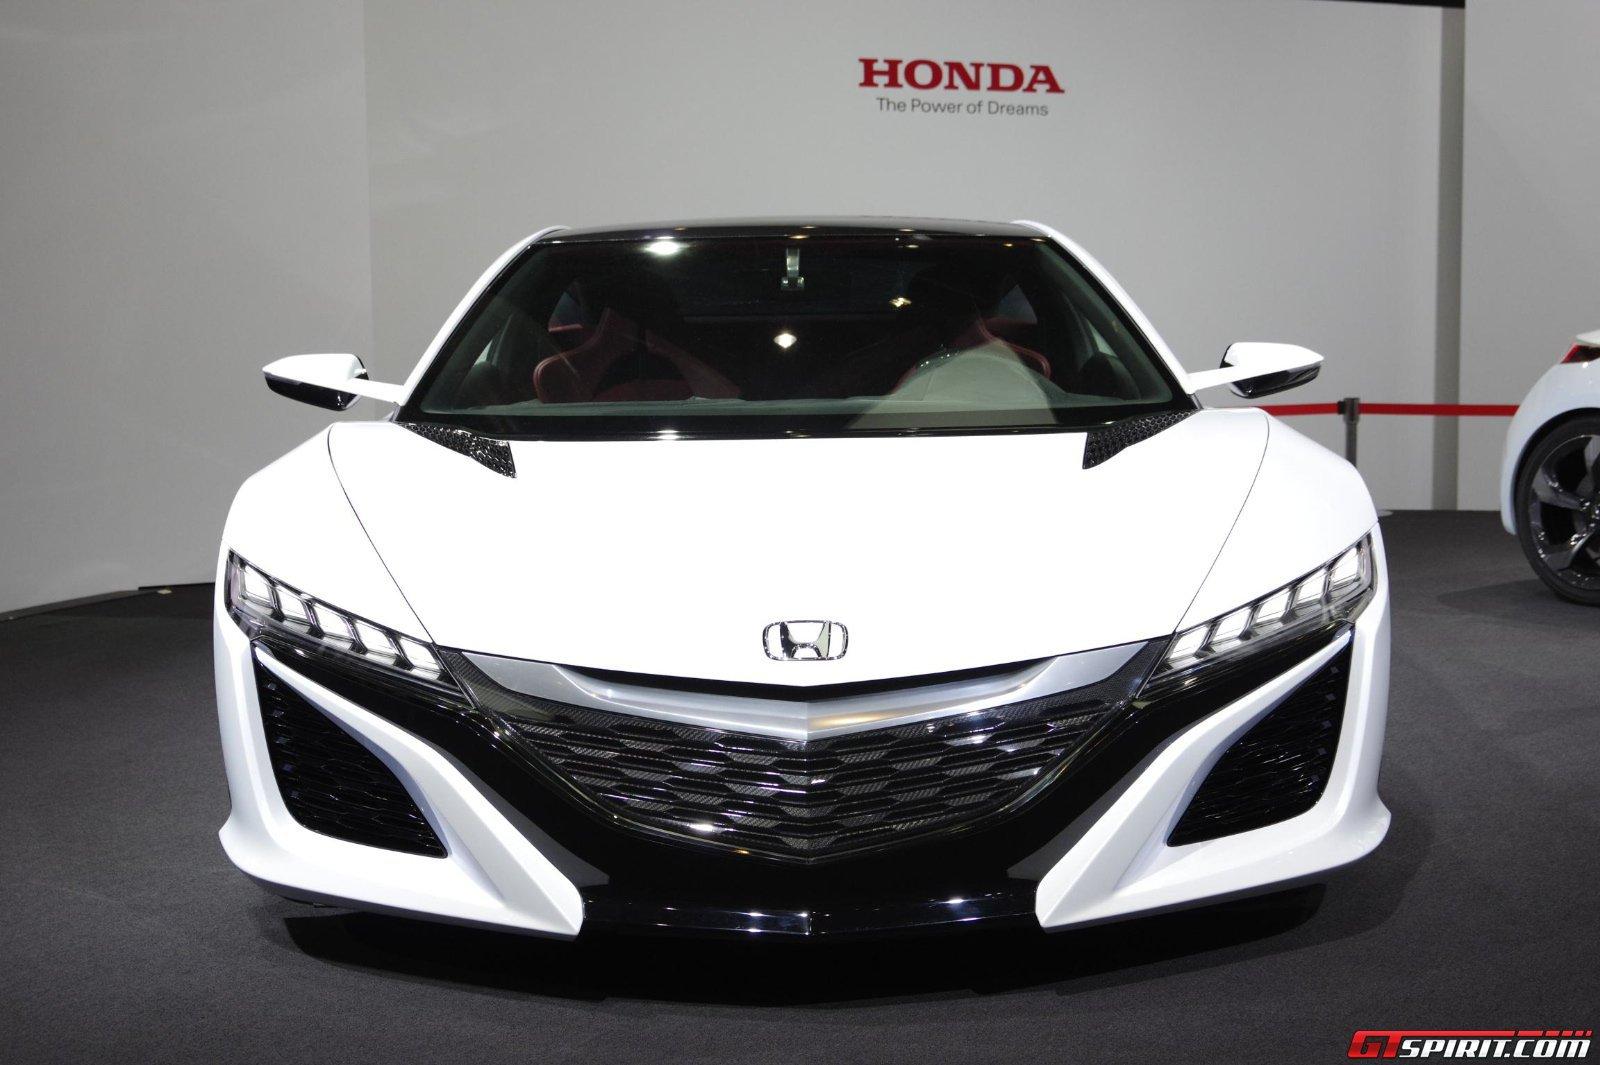 Gallery Tokyo 2013 Honda Nsx 8 Photos Gtspirit Accord Knock Sensor Location Concept In White Live